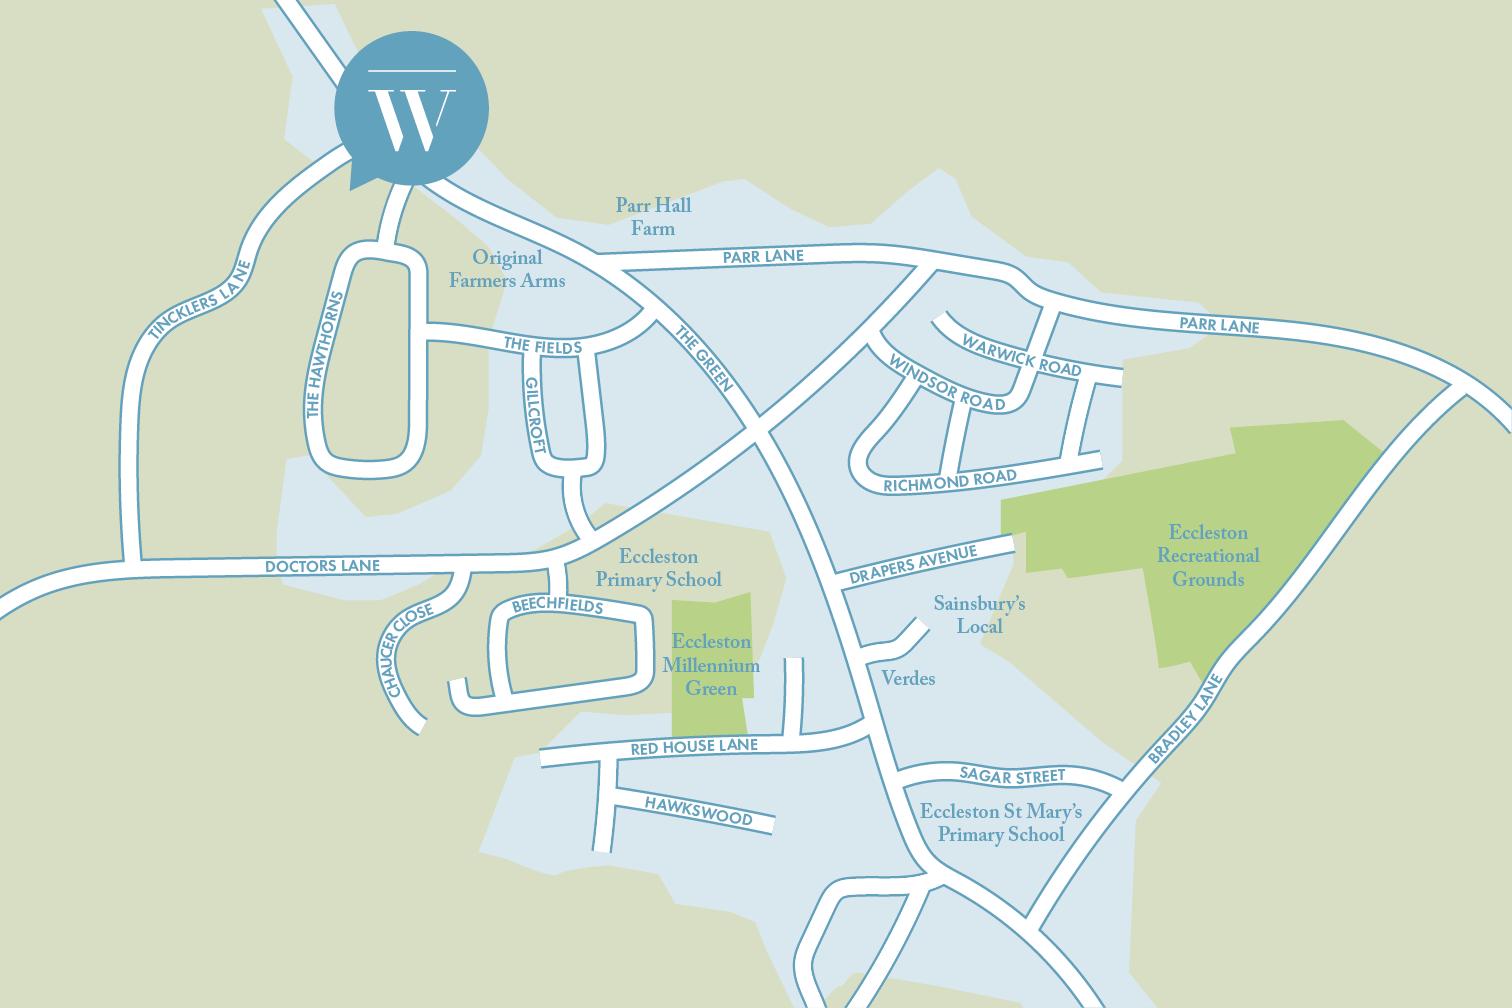 tincklers fold - local map@2x.png